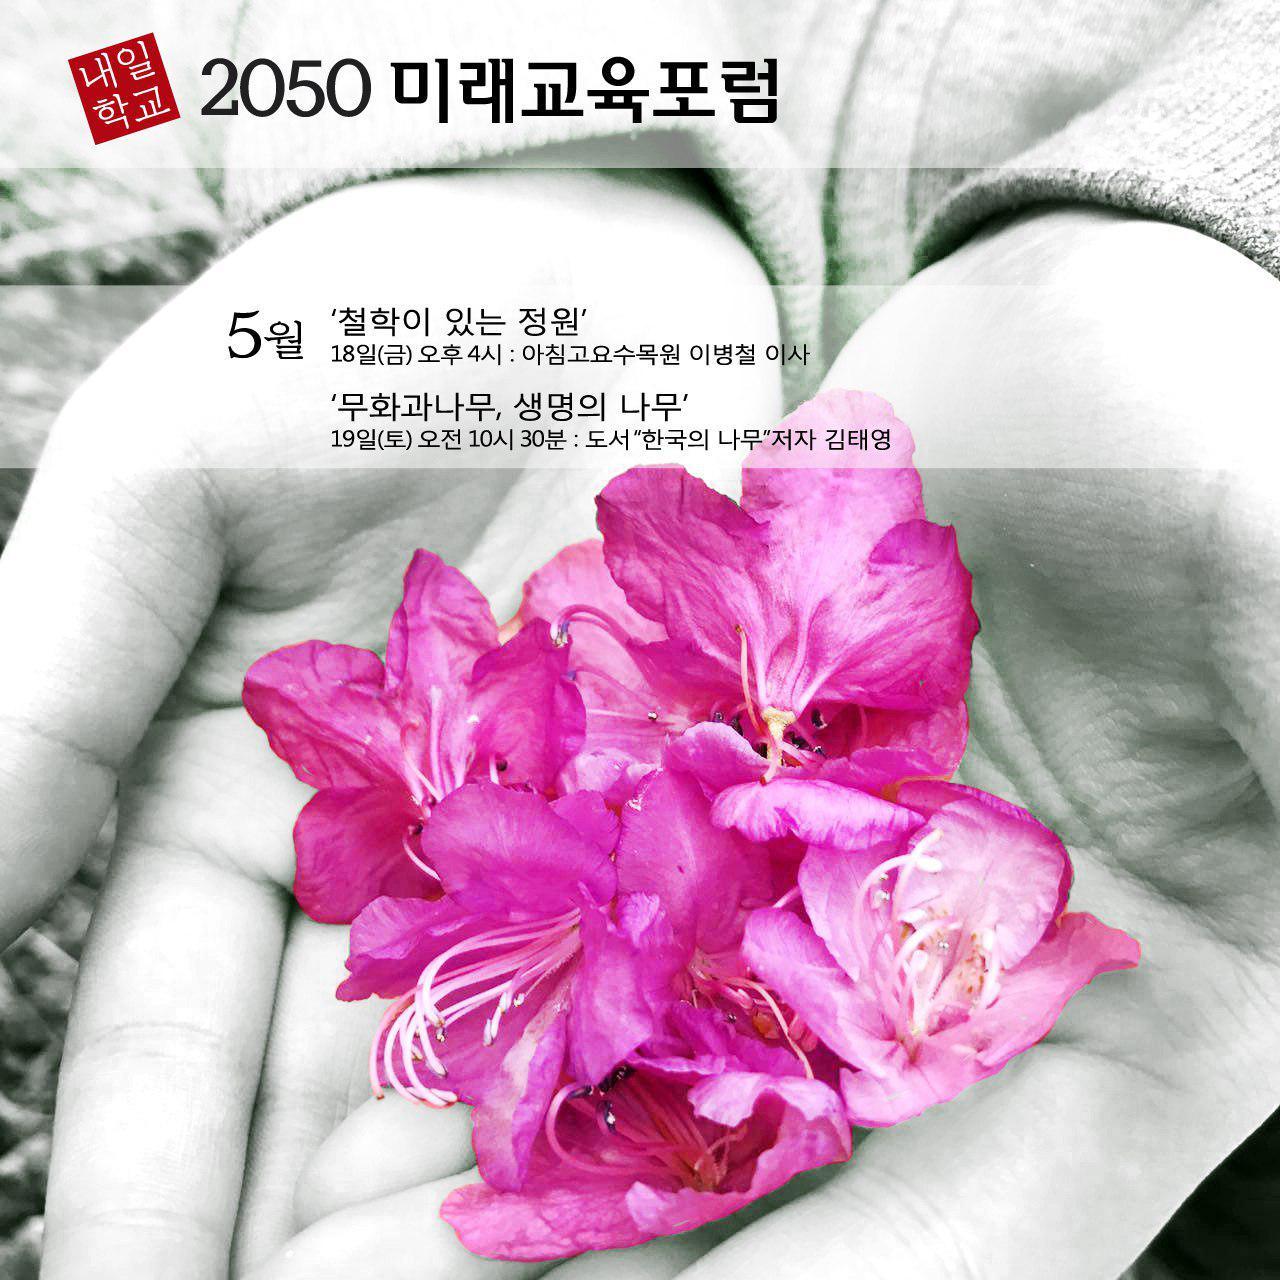 photo_2018-05-08_10-34-44.jpg